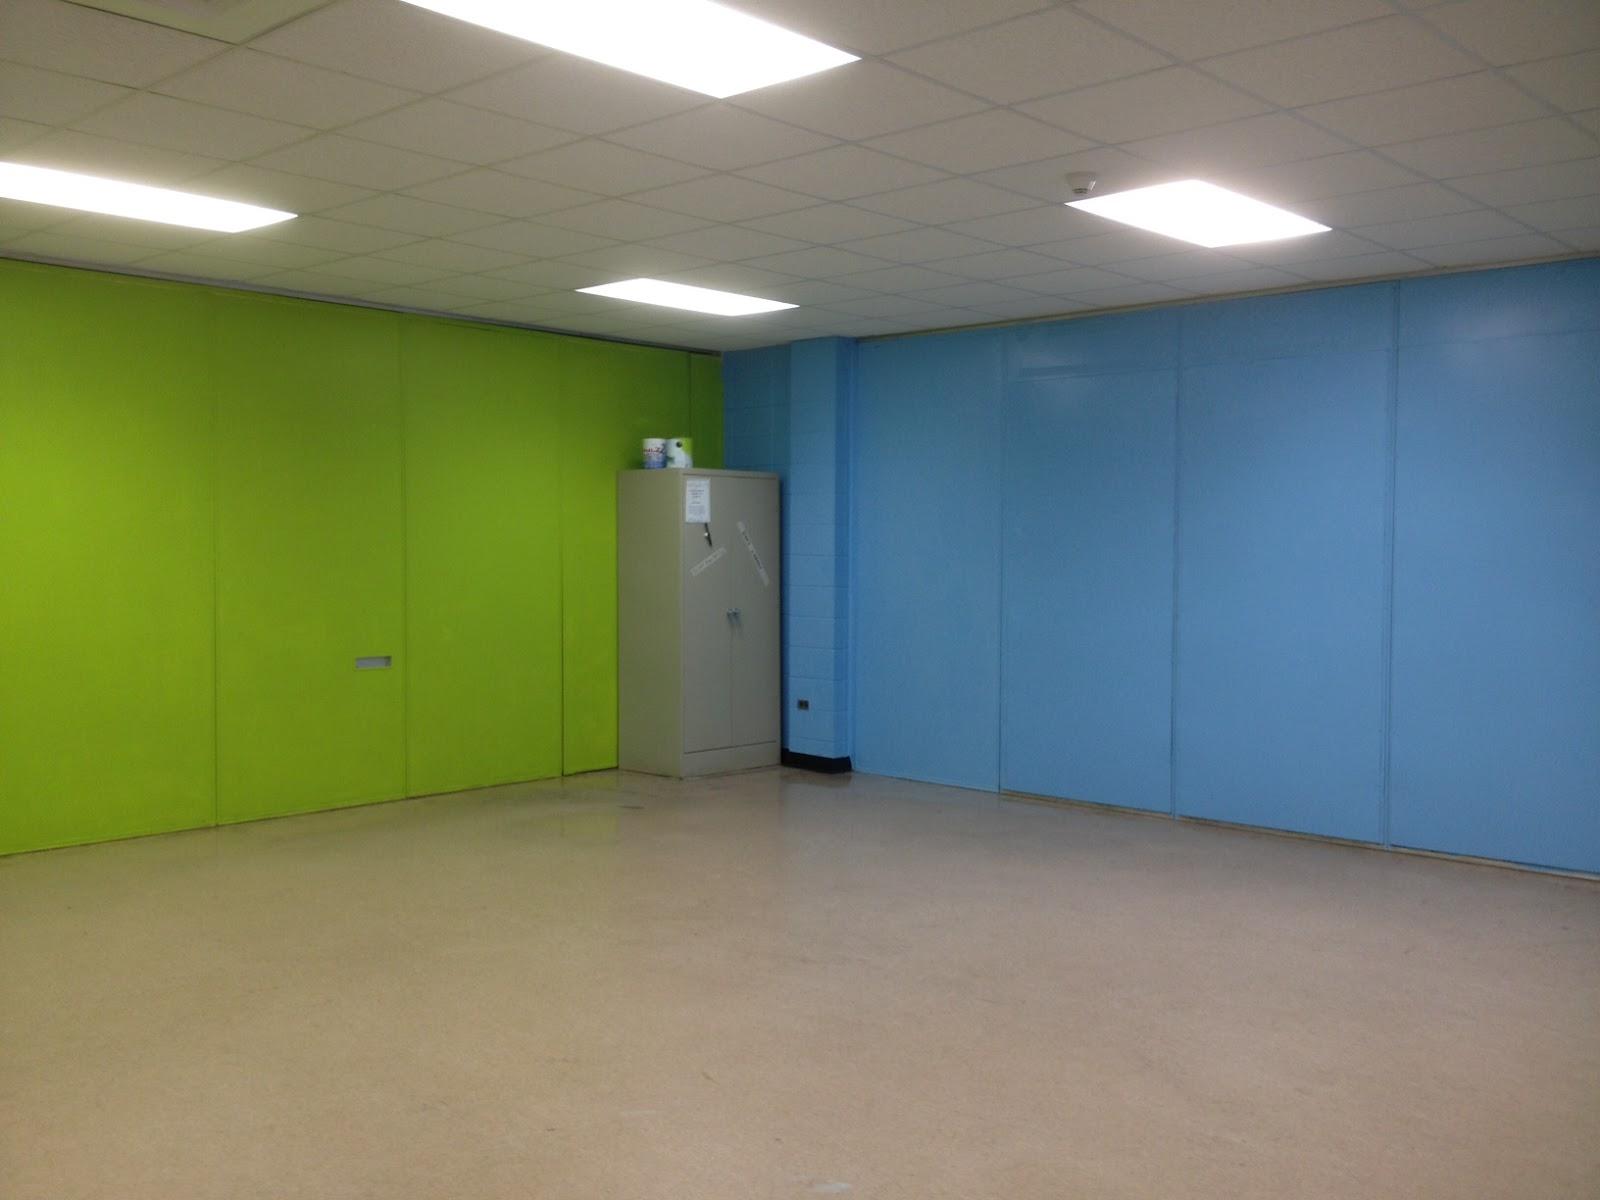 Classroom Design Colors ~ Tonya s take on teaching new classroom